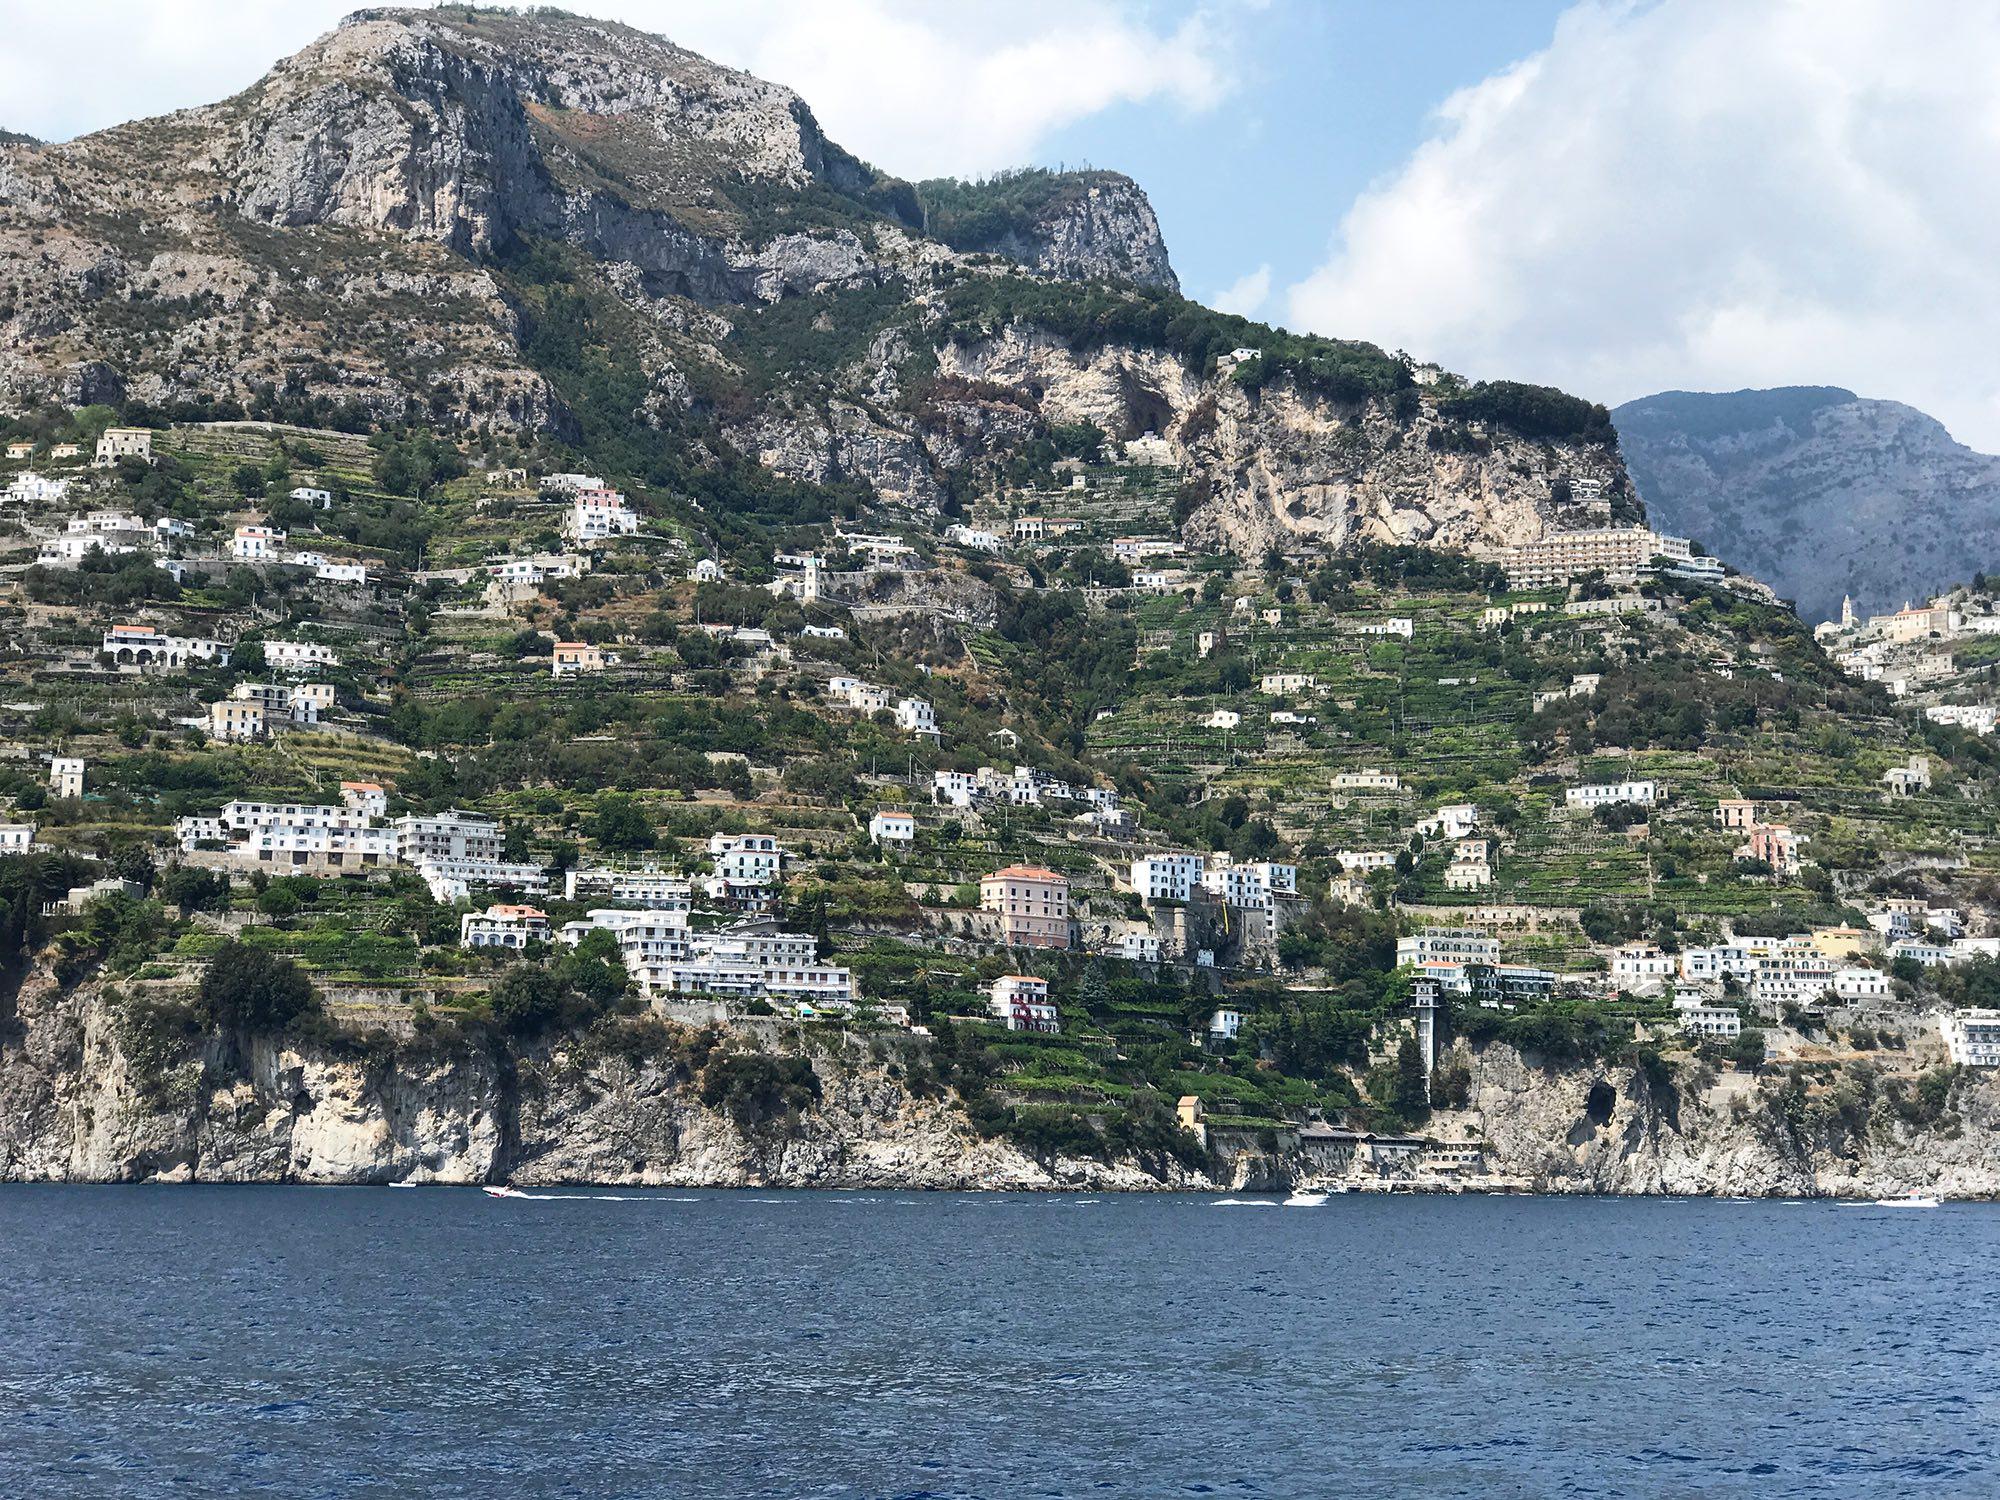 Amalfi-town-Amalfi-Coast.jpg